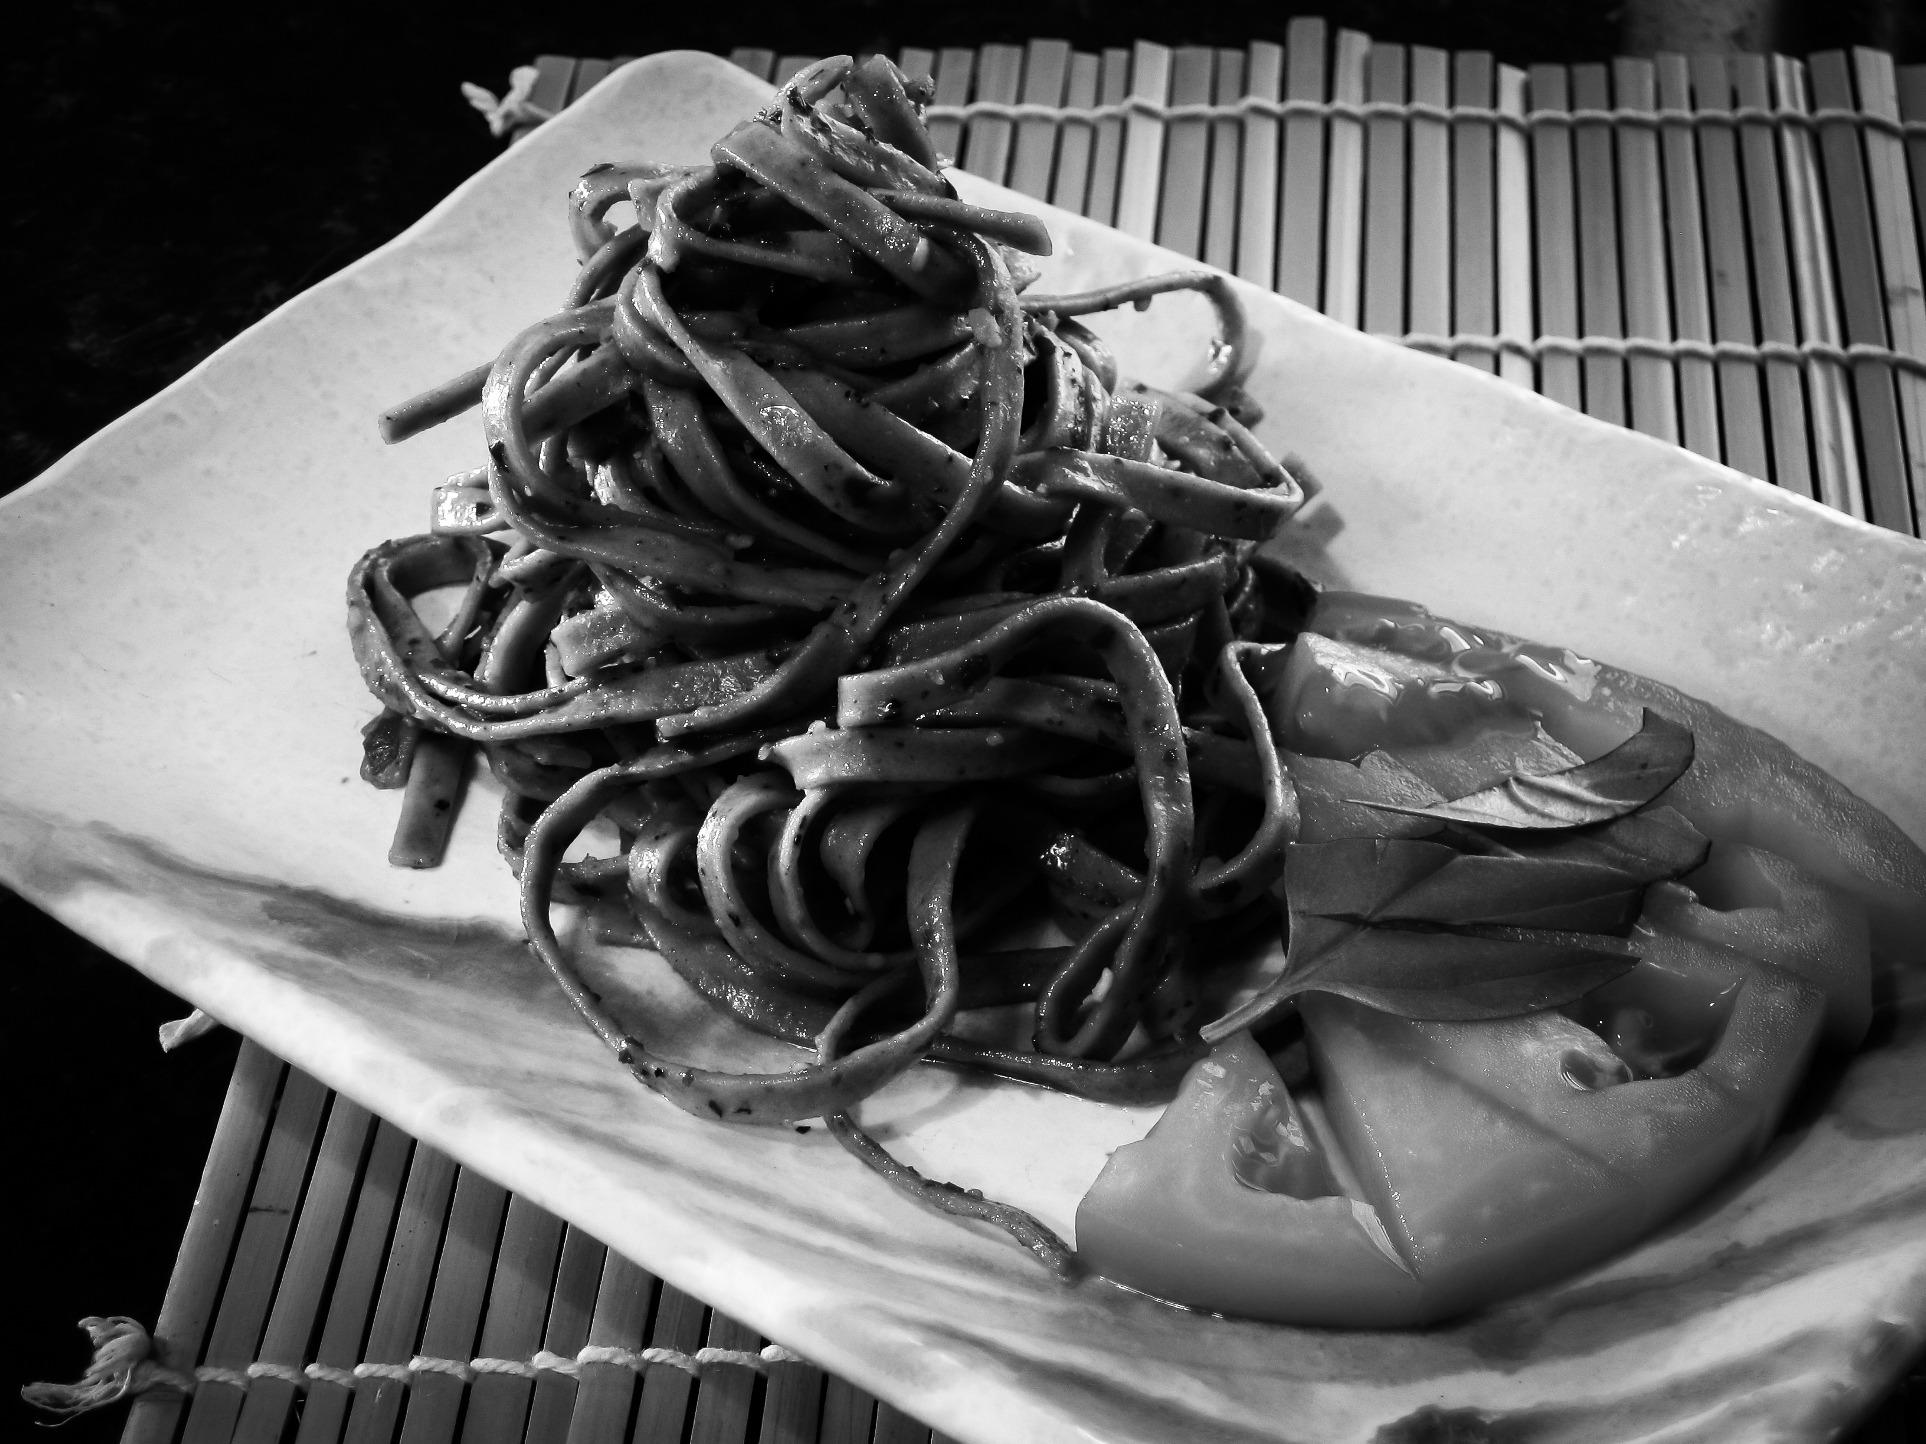 Gambar Hitam Dan Putih Satu Warna Masakan Pasta Pesto Tomat Patung Makan Malam Italia Fotografi Monokrom 1926x1444 1256965 Galeri Foto Pxhere